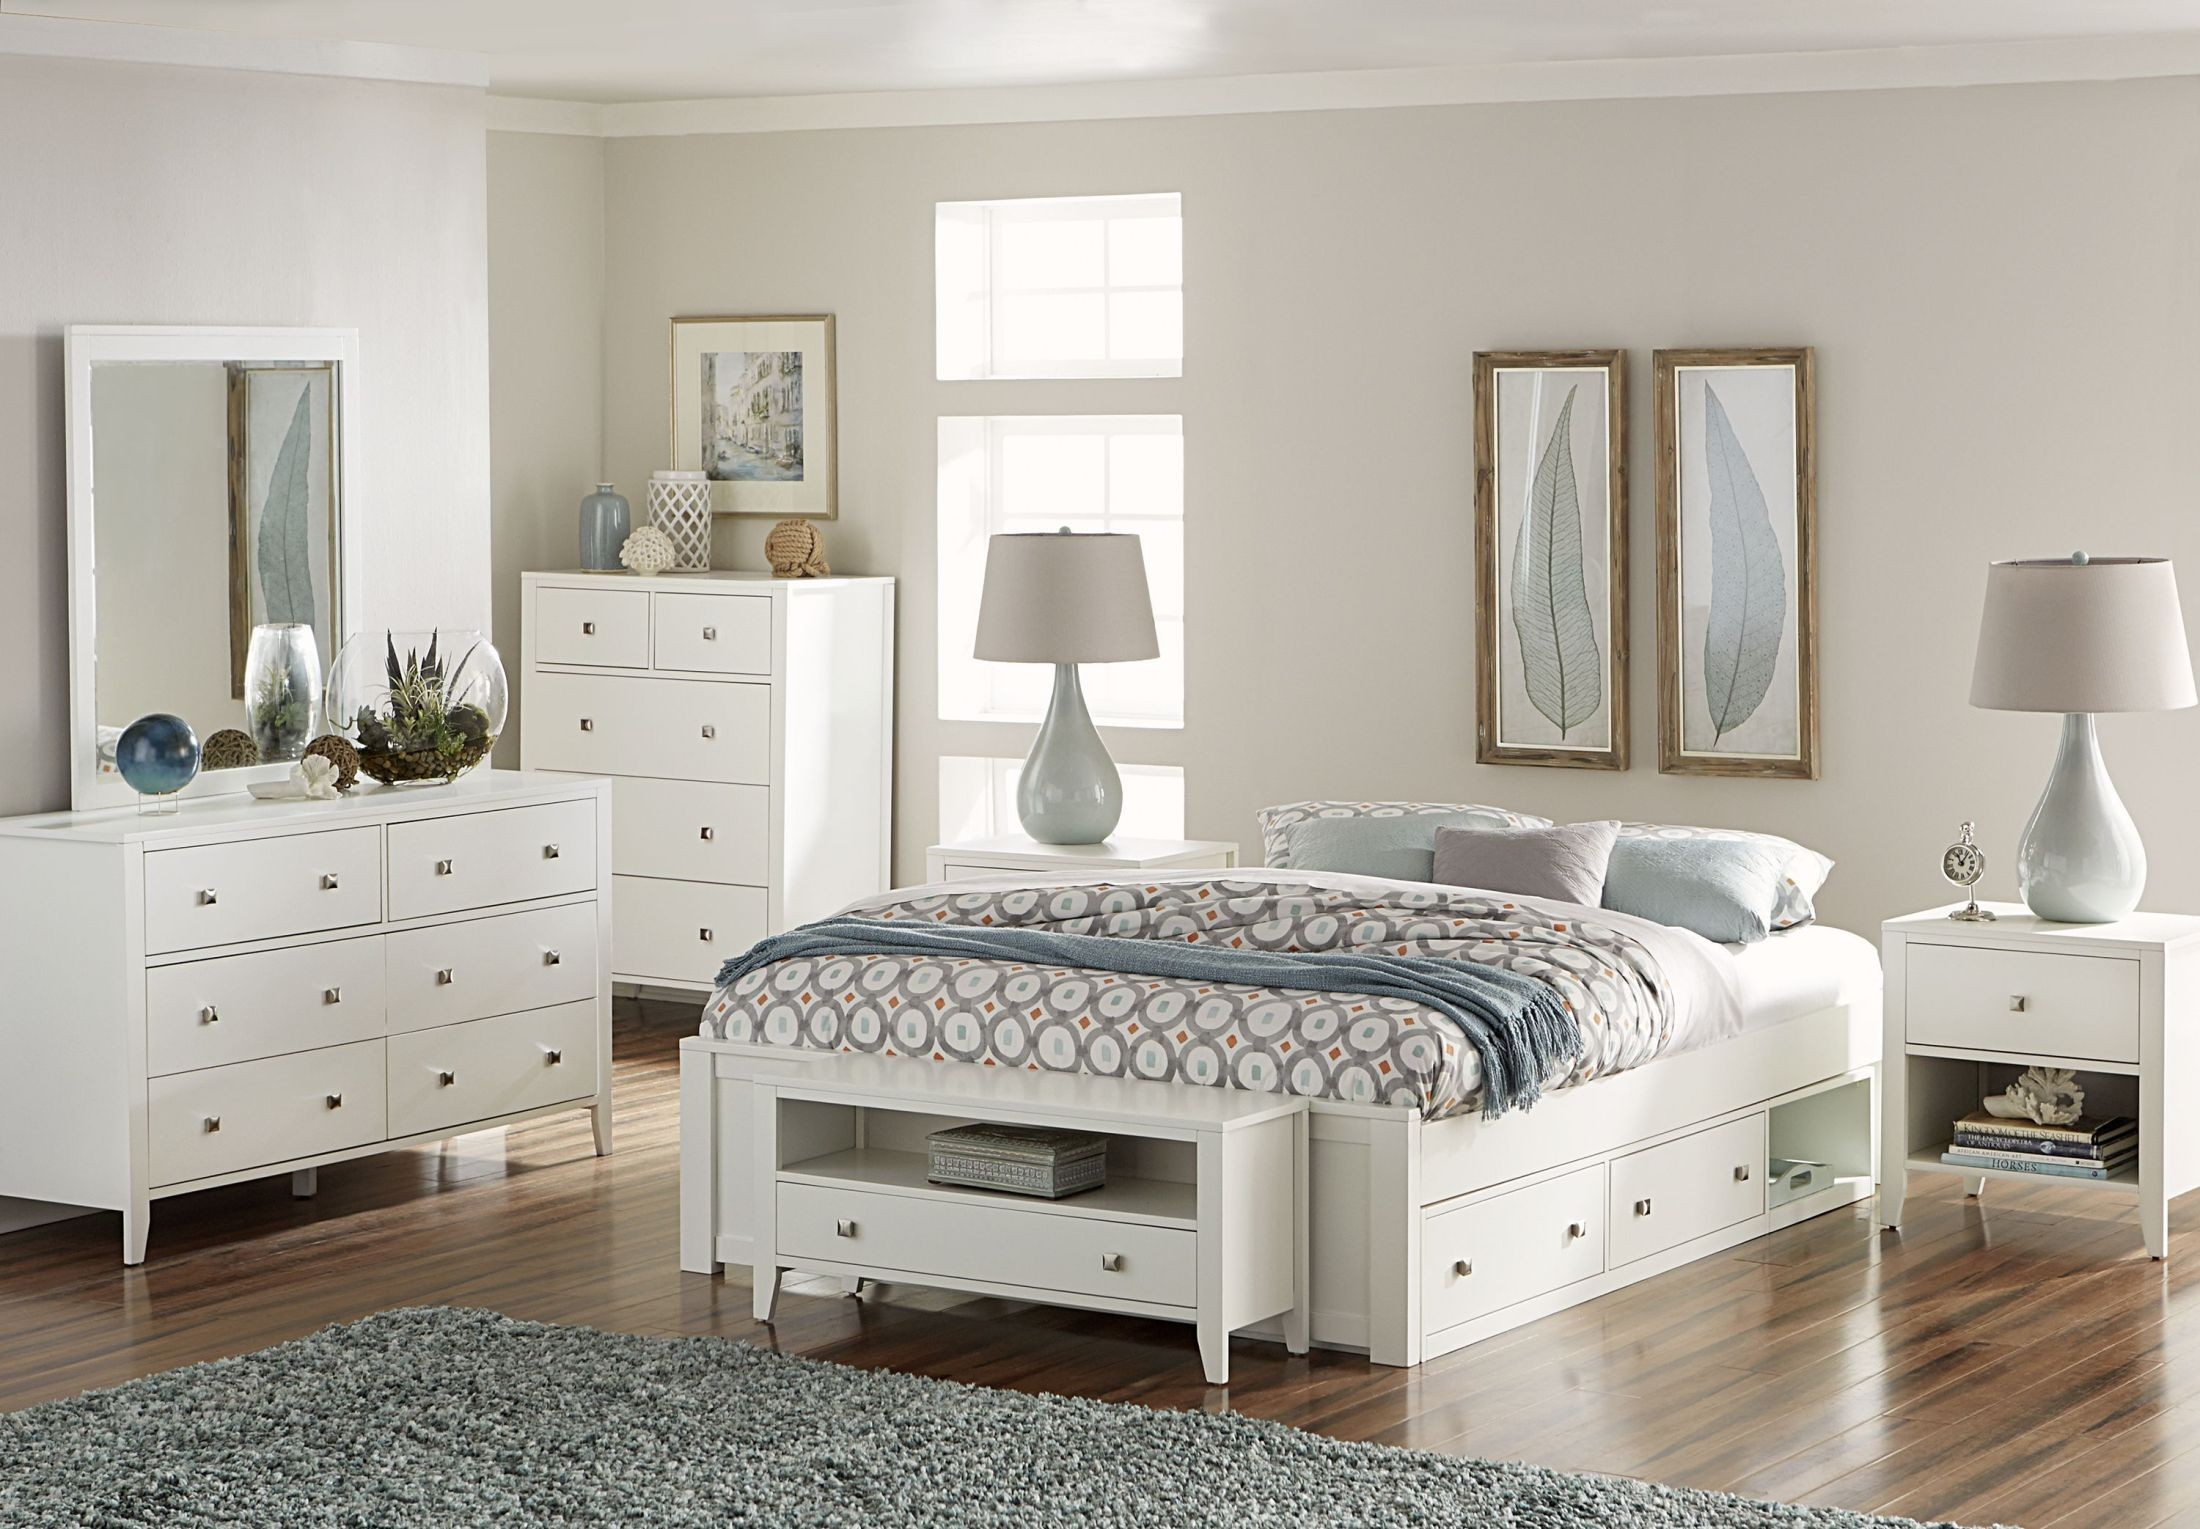 Pulse white platform bedroom set with storage from ne kids - Platform bedroom sets with storage ...